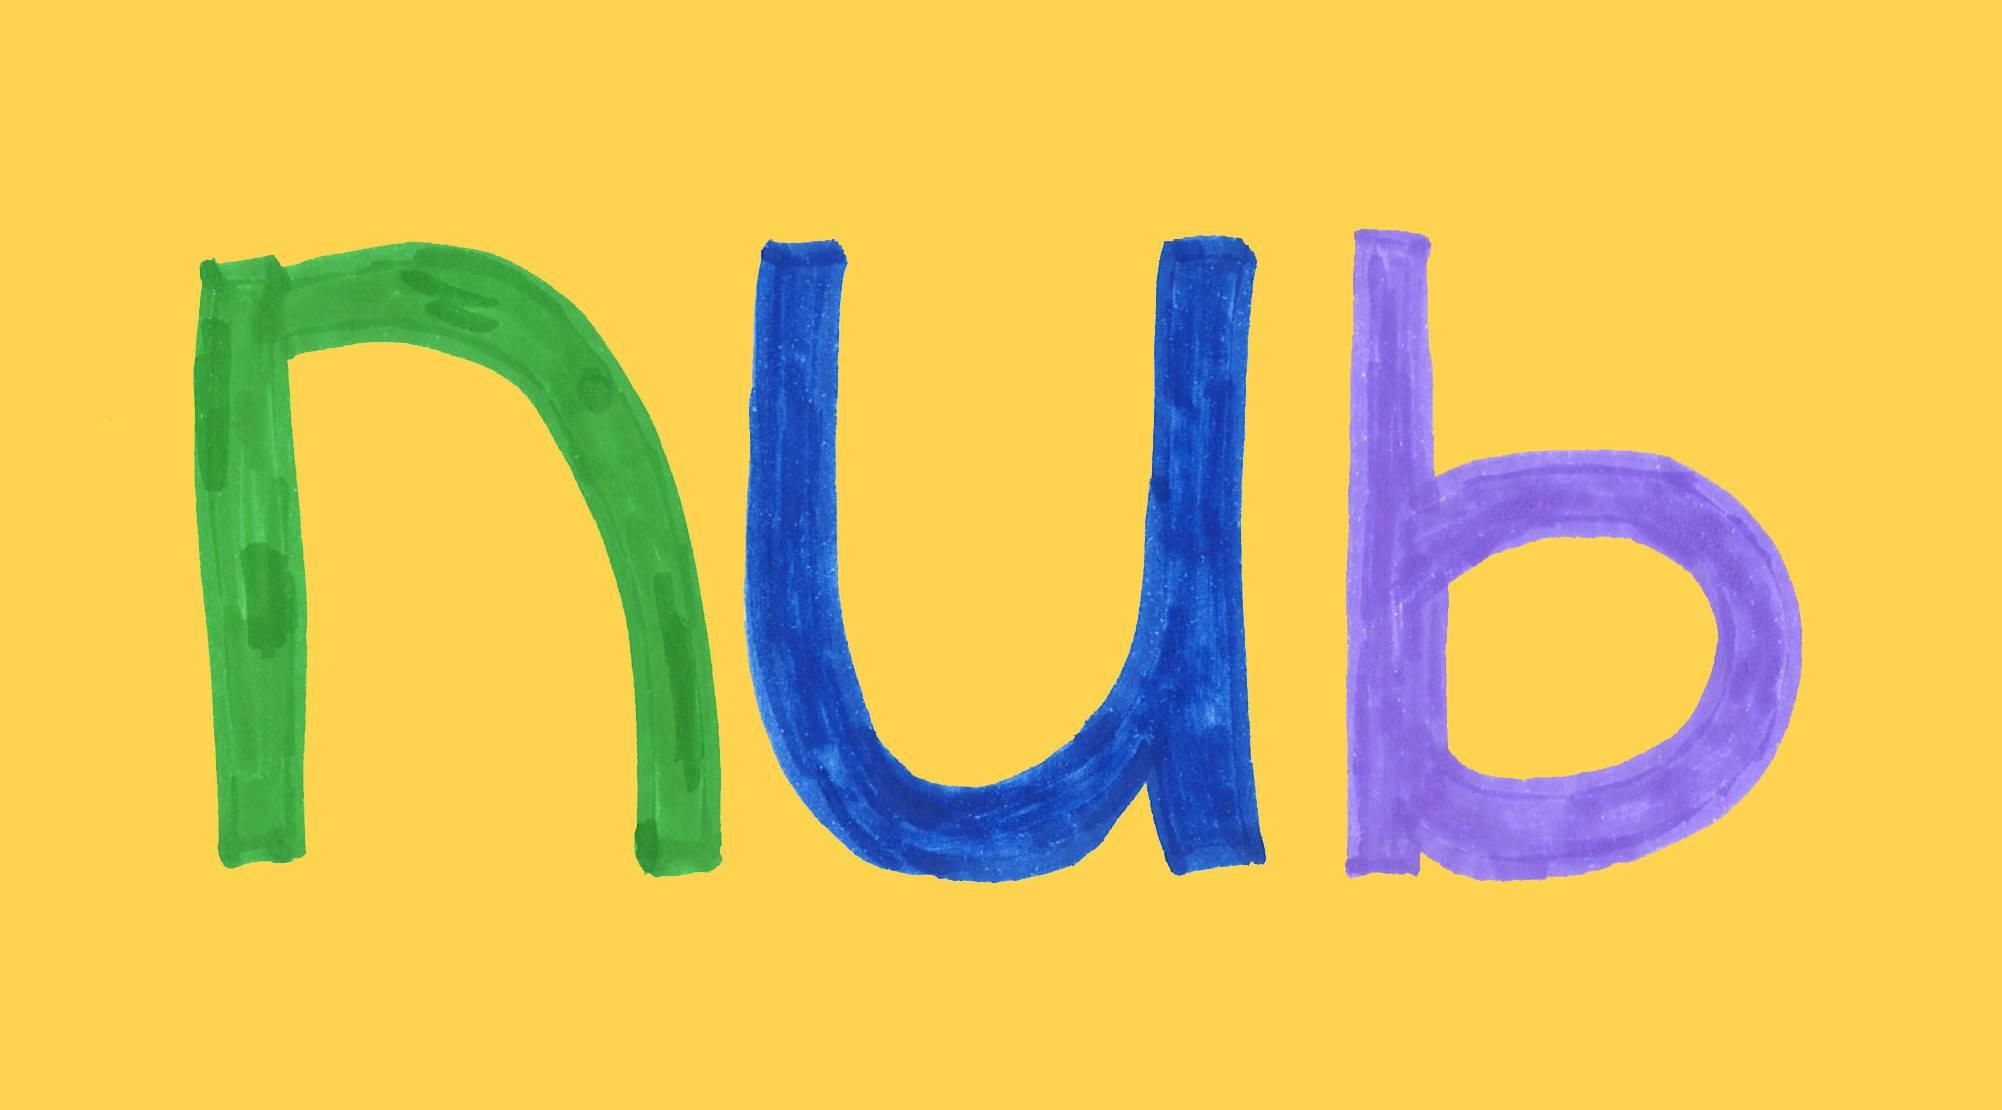 Nub Music